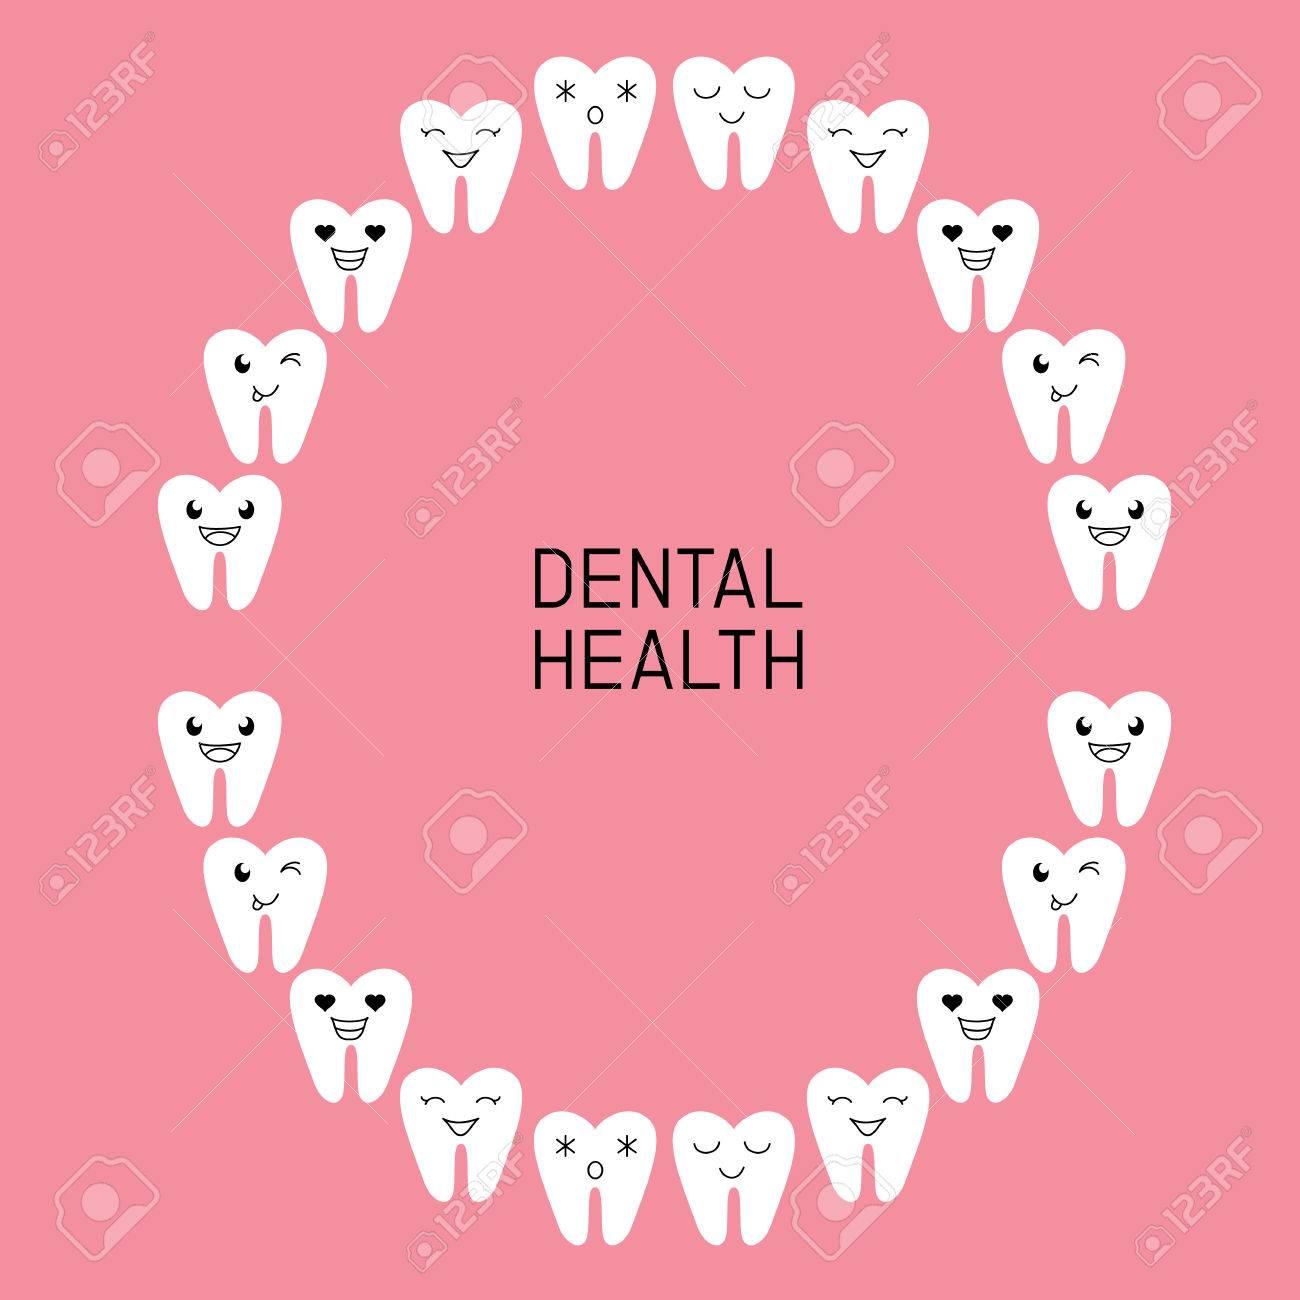 Dental health diagram teeth illustration royalty free cliparts dental health diagram teeth illustration stock vector 57158146 ccuart Gallery